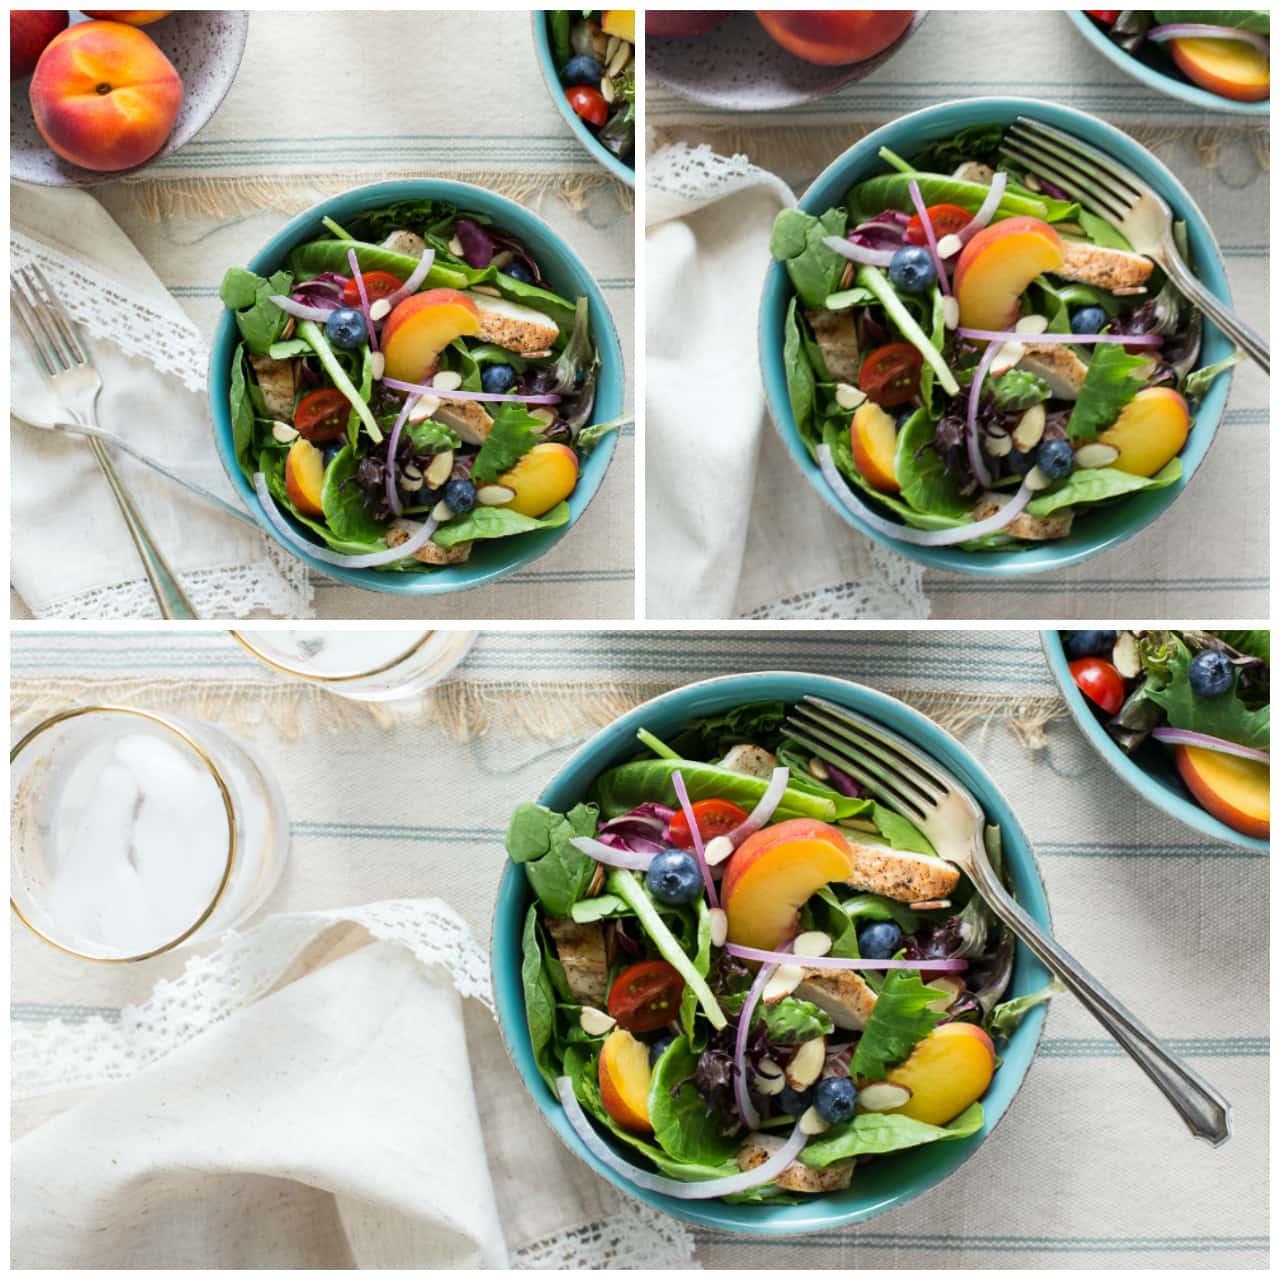 Grilled Chicken & Peach Salad with Honey Peach Vinaigrette